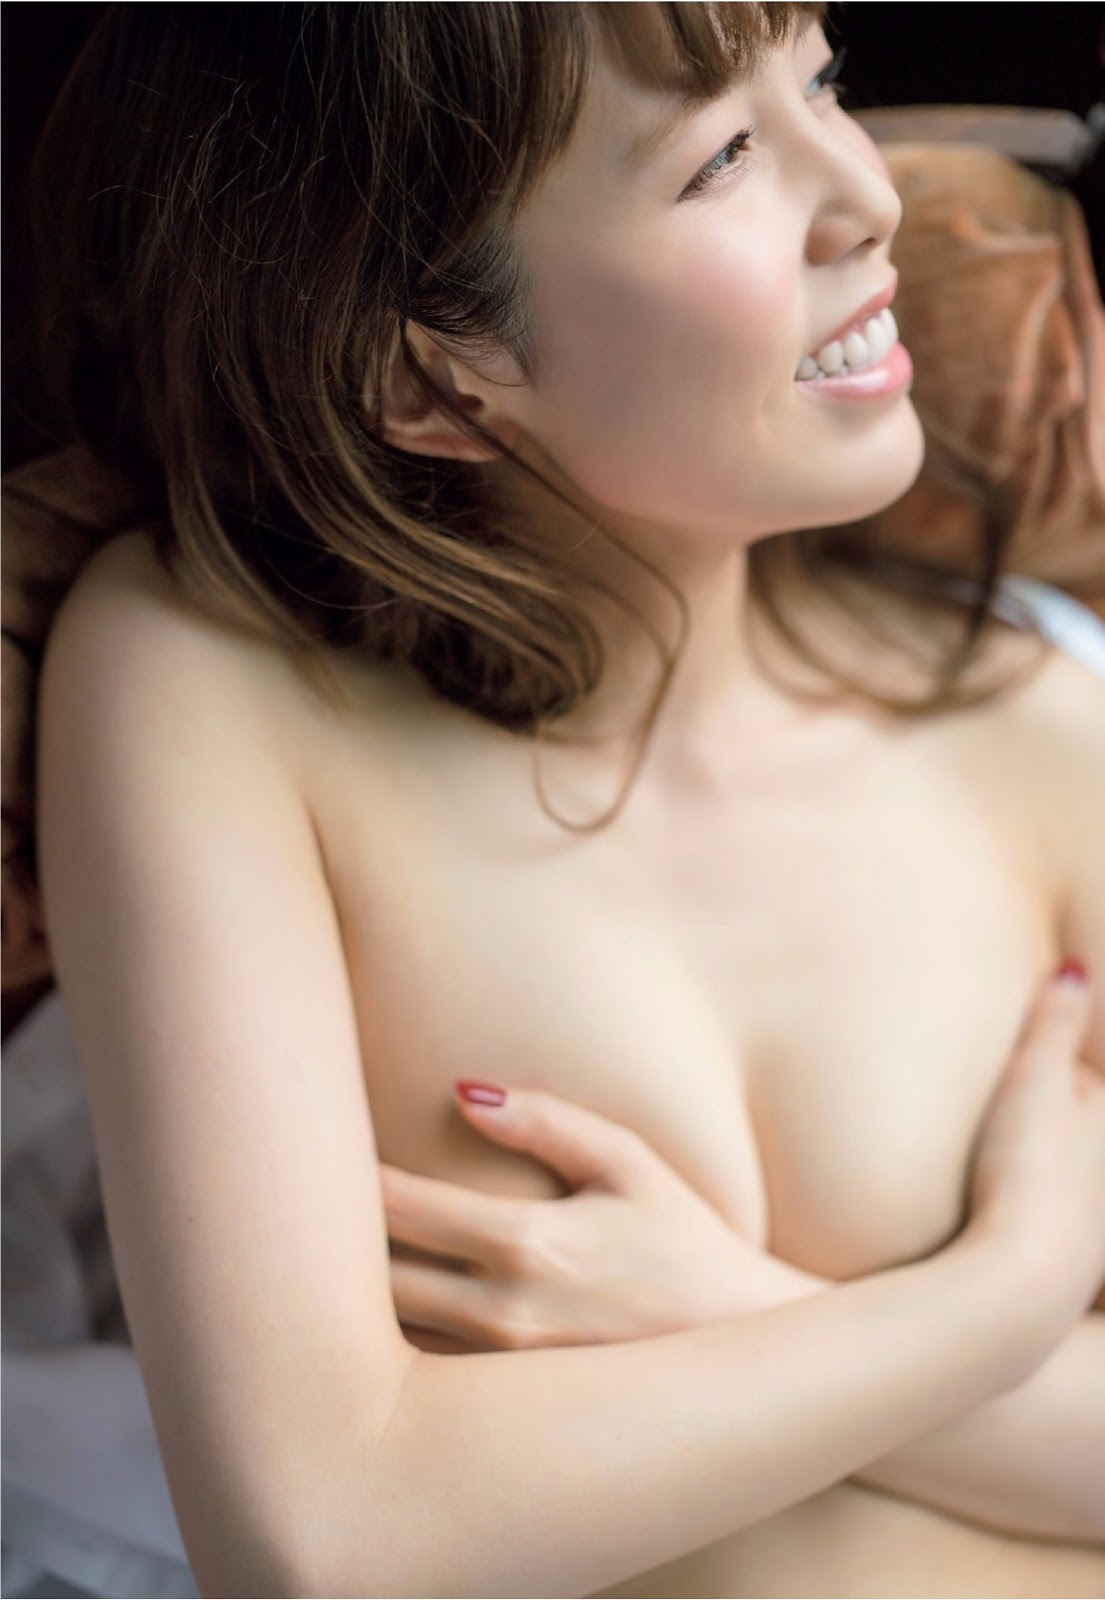 Mika Kikuchi 菊地美香, FLASH 電子版 2017.11.14 (フラッシュ 2017年11月14日号)